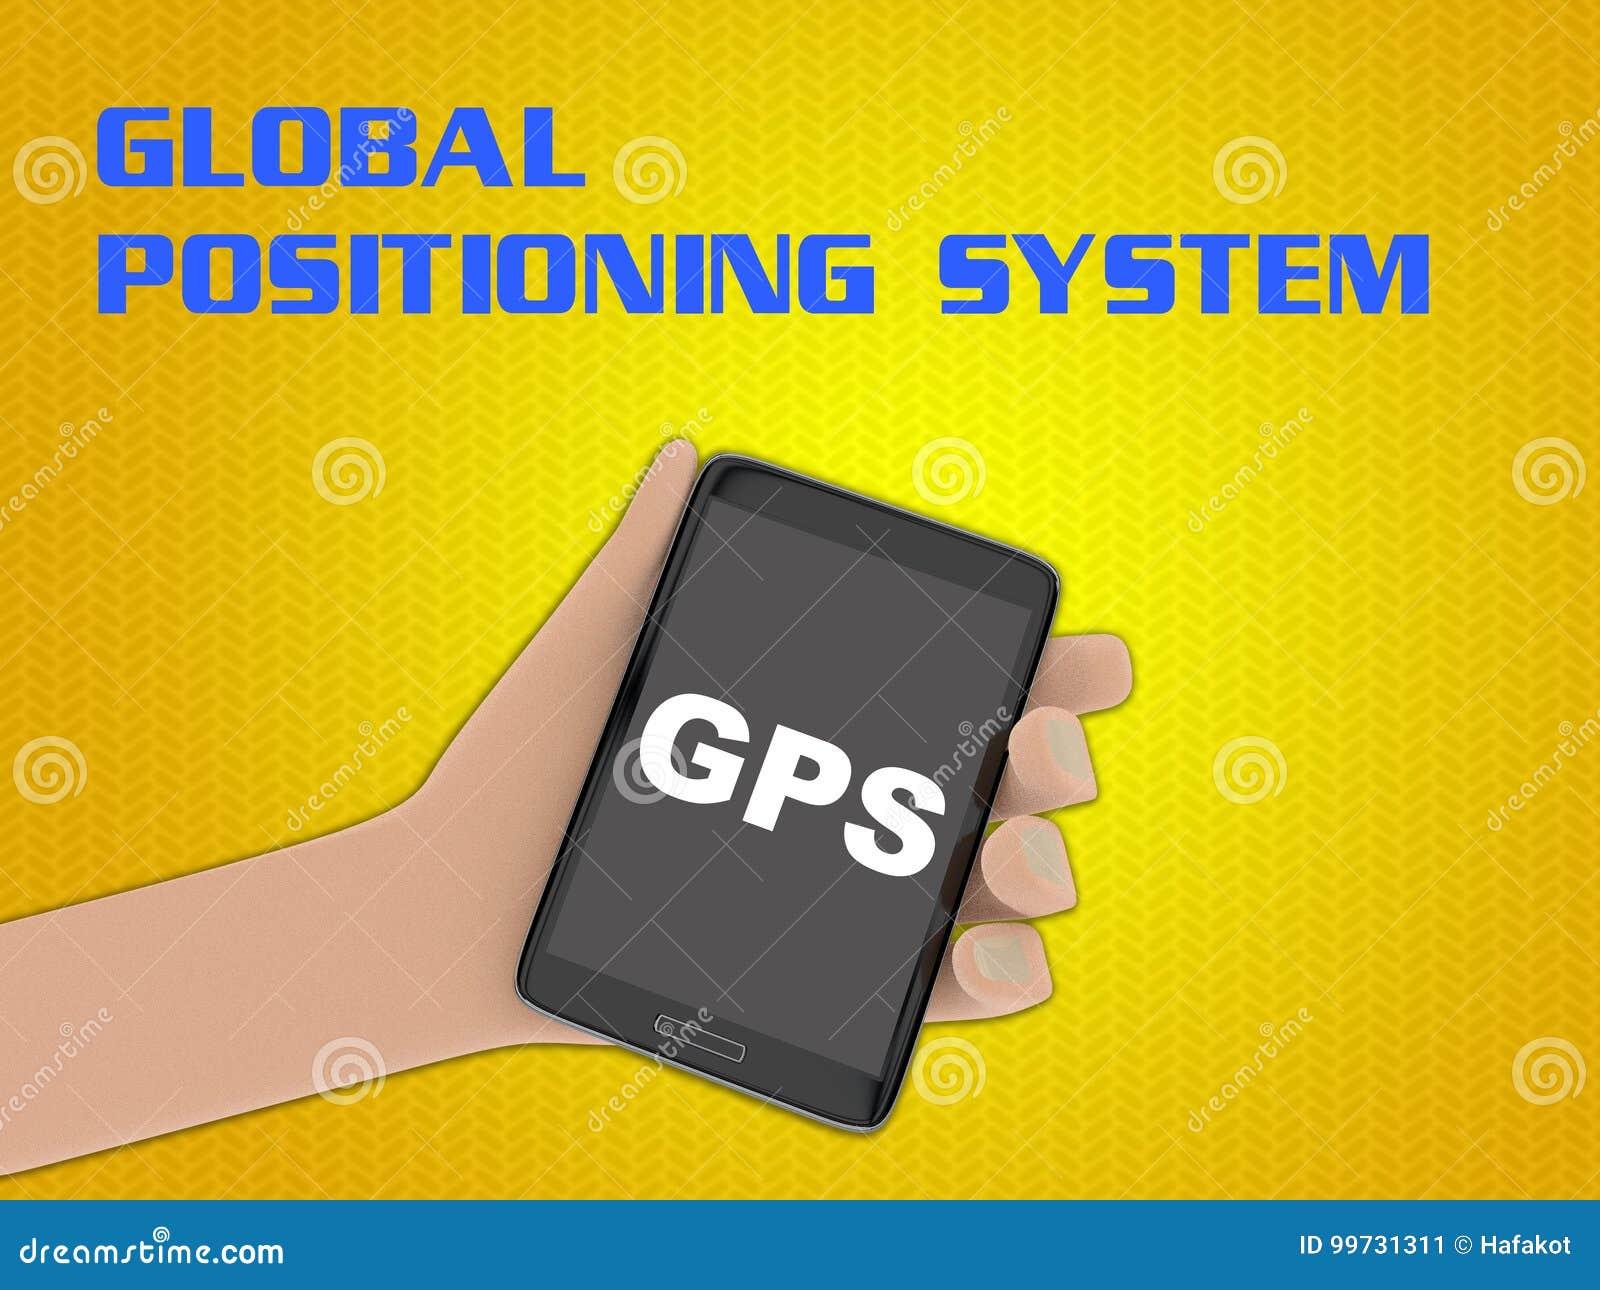 gps global positioning system concept stock illustration